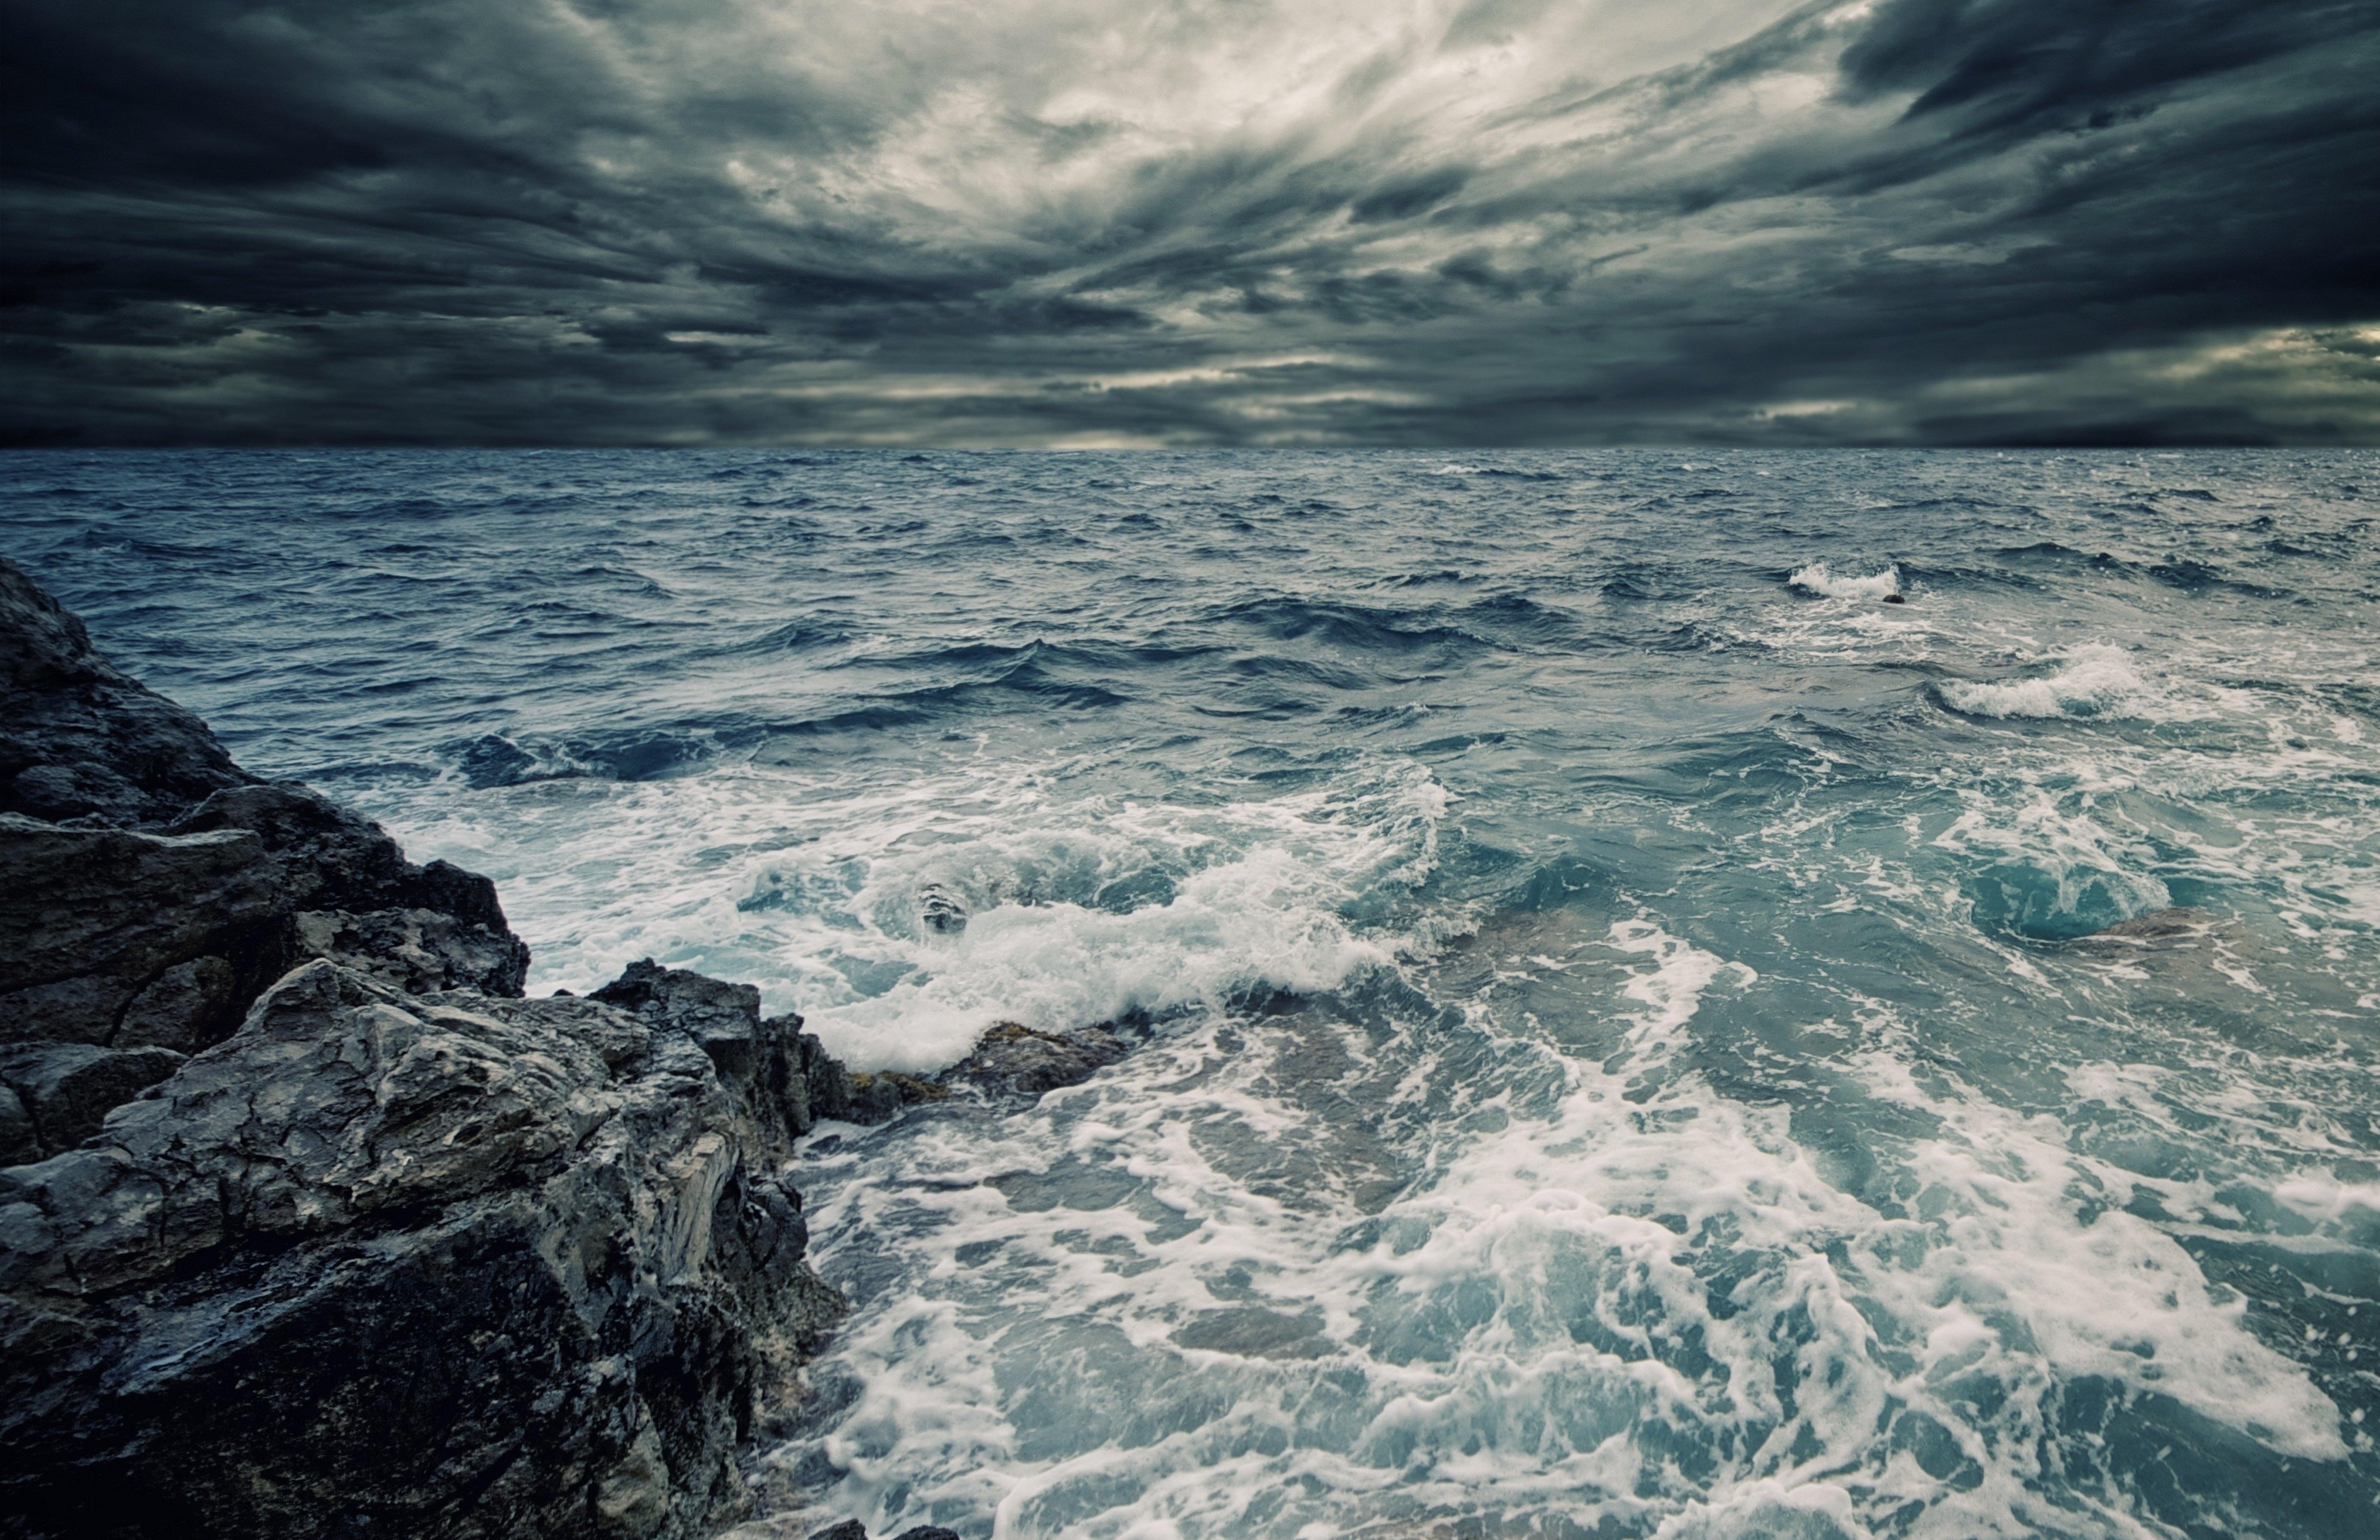 Sea ocean waves water splashing the rock partly cloudy sky 5610x3630